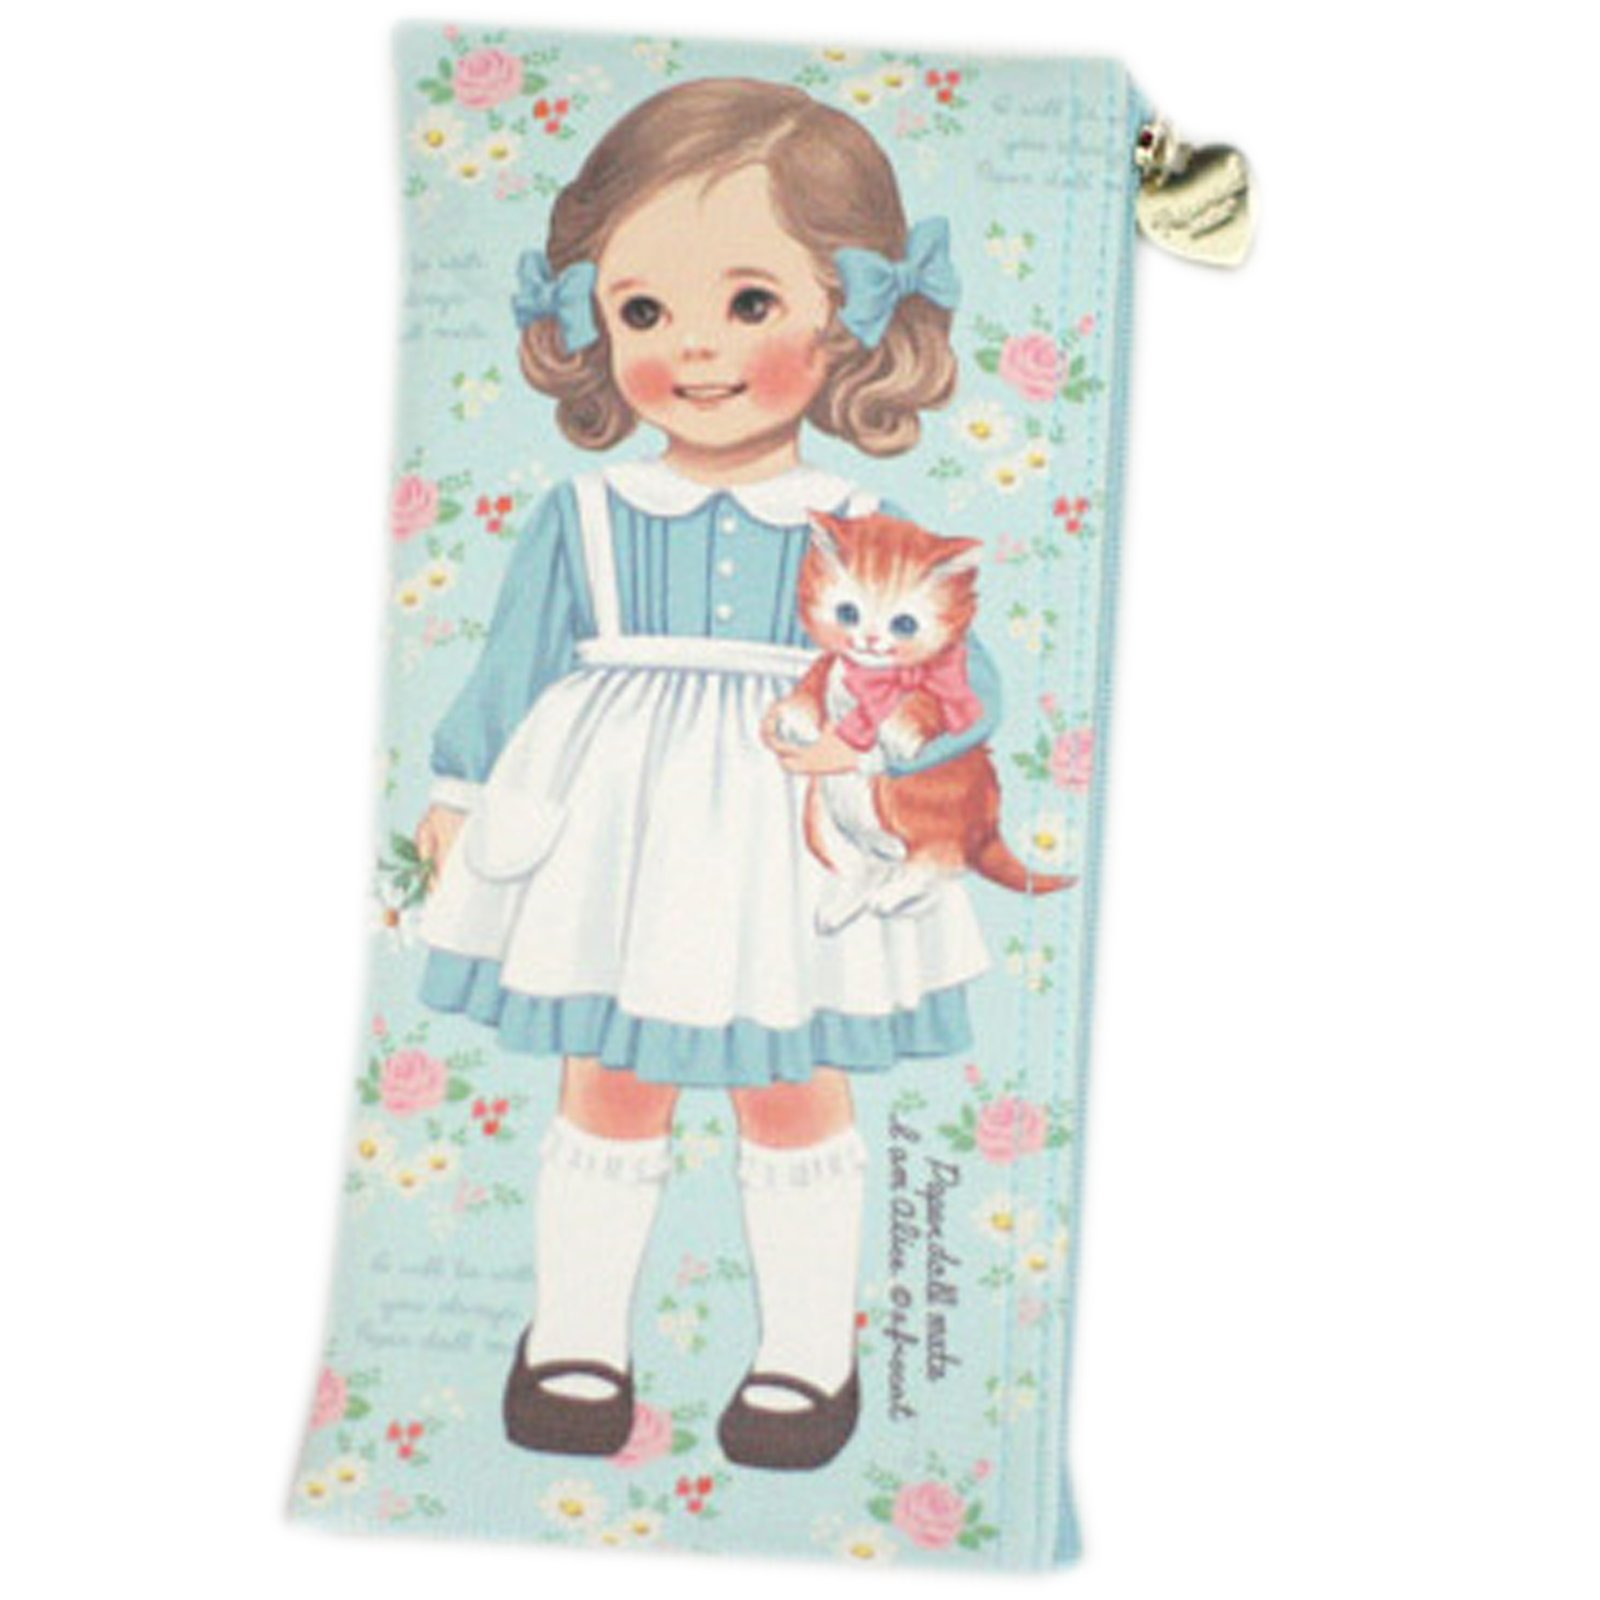 Afrocat Paper Doll Mate 新笔盒玫瑰铅笔*刷多功能袋